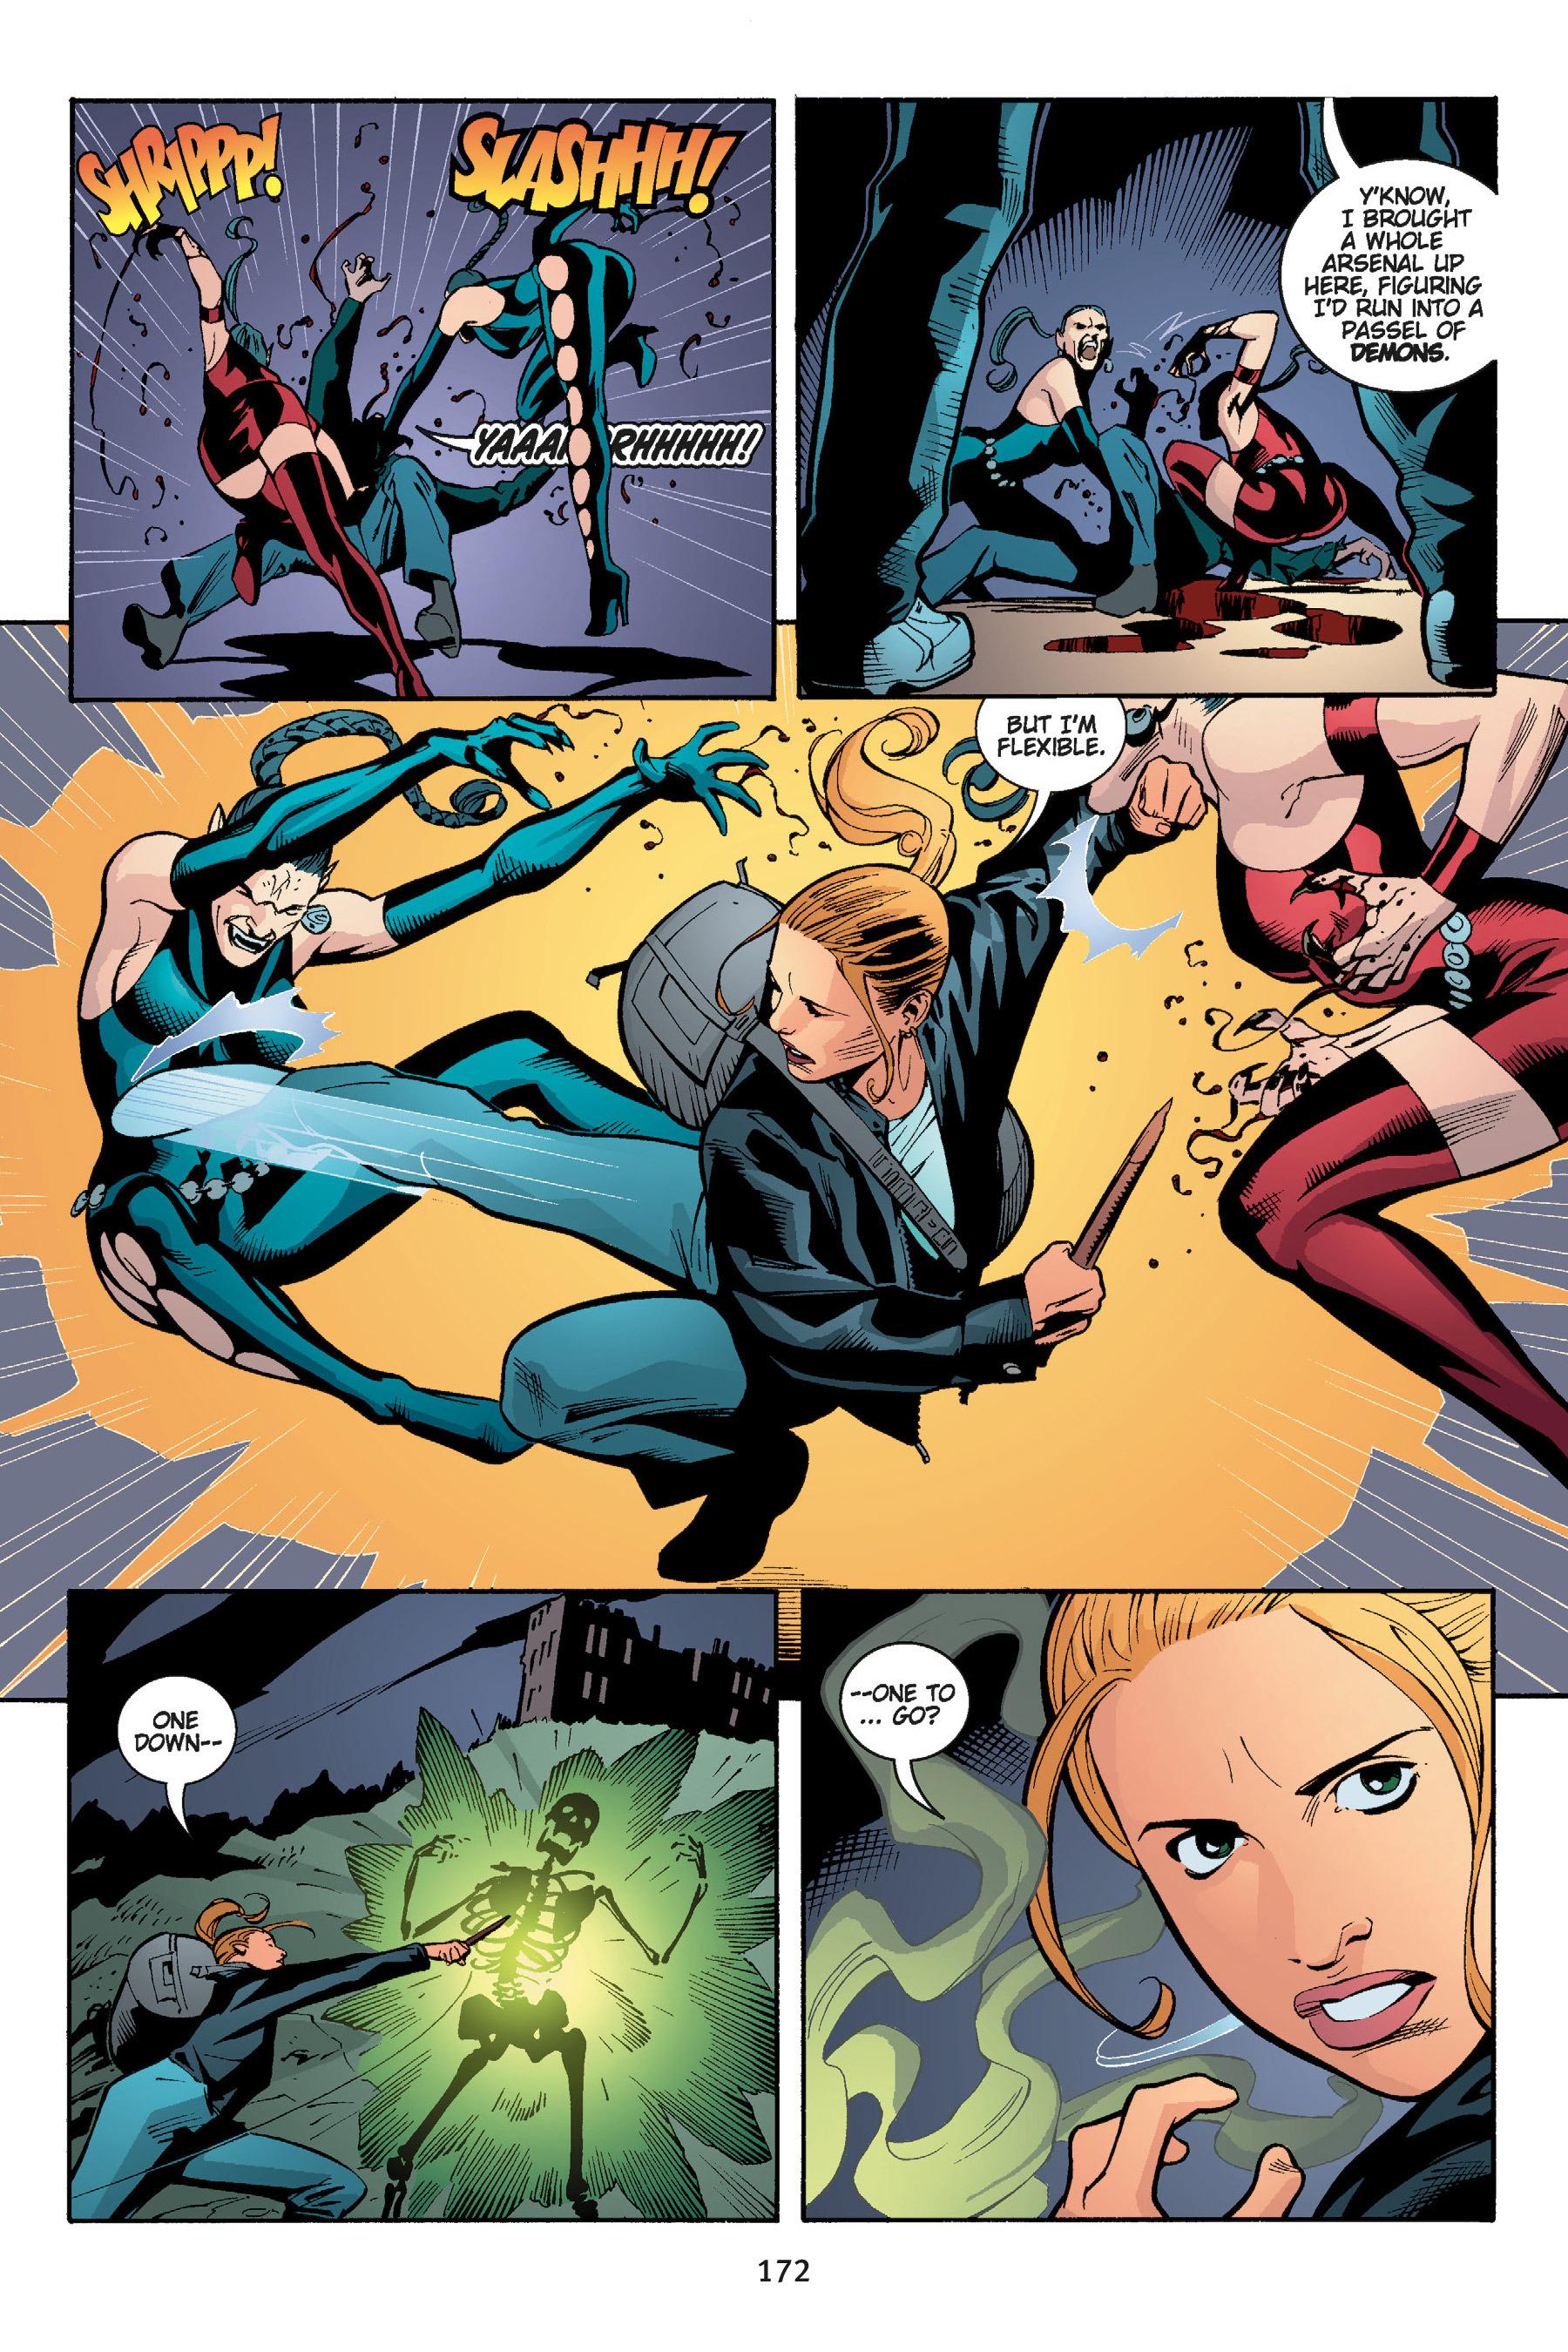 Read online Buffy the Vampire Slayer: Omnibus comic -  Issue # TPB 5 - 172